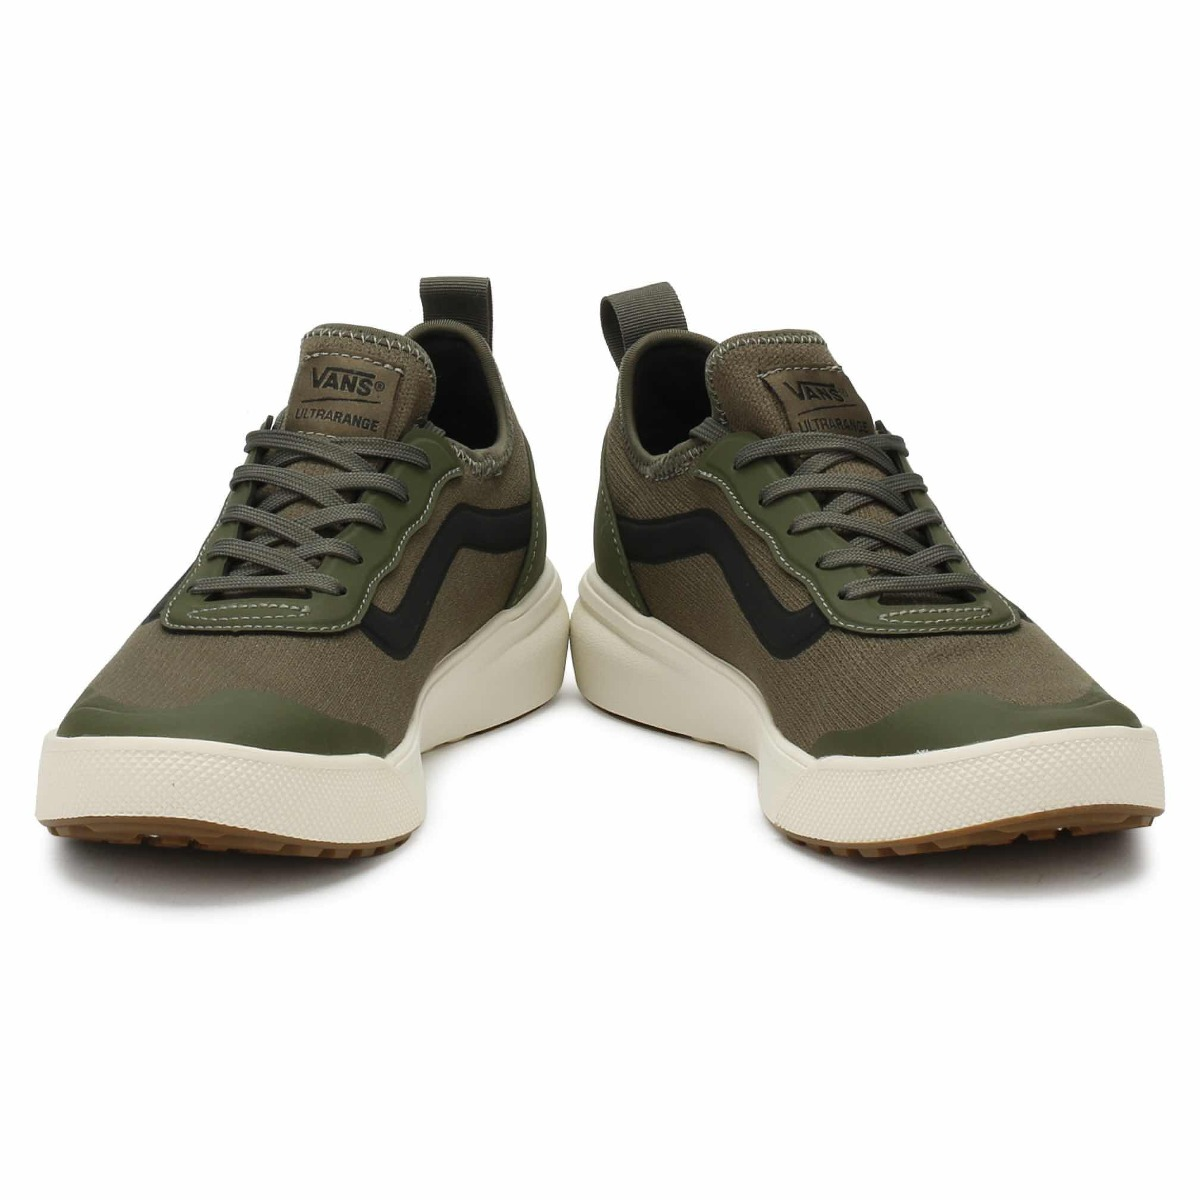 34f8eeb68fa76 zapatillas vans ultra range ac knit grape leaf. Cargando zoom.